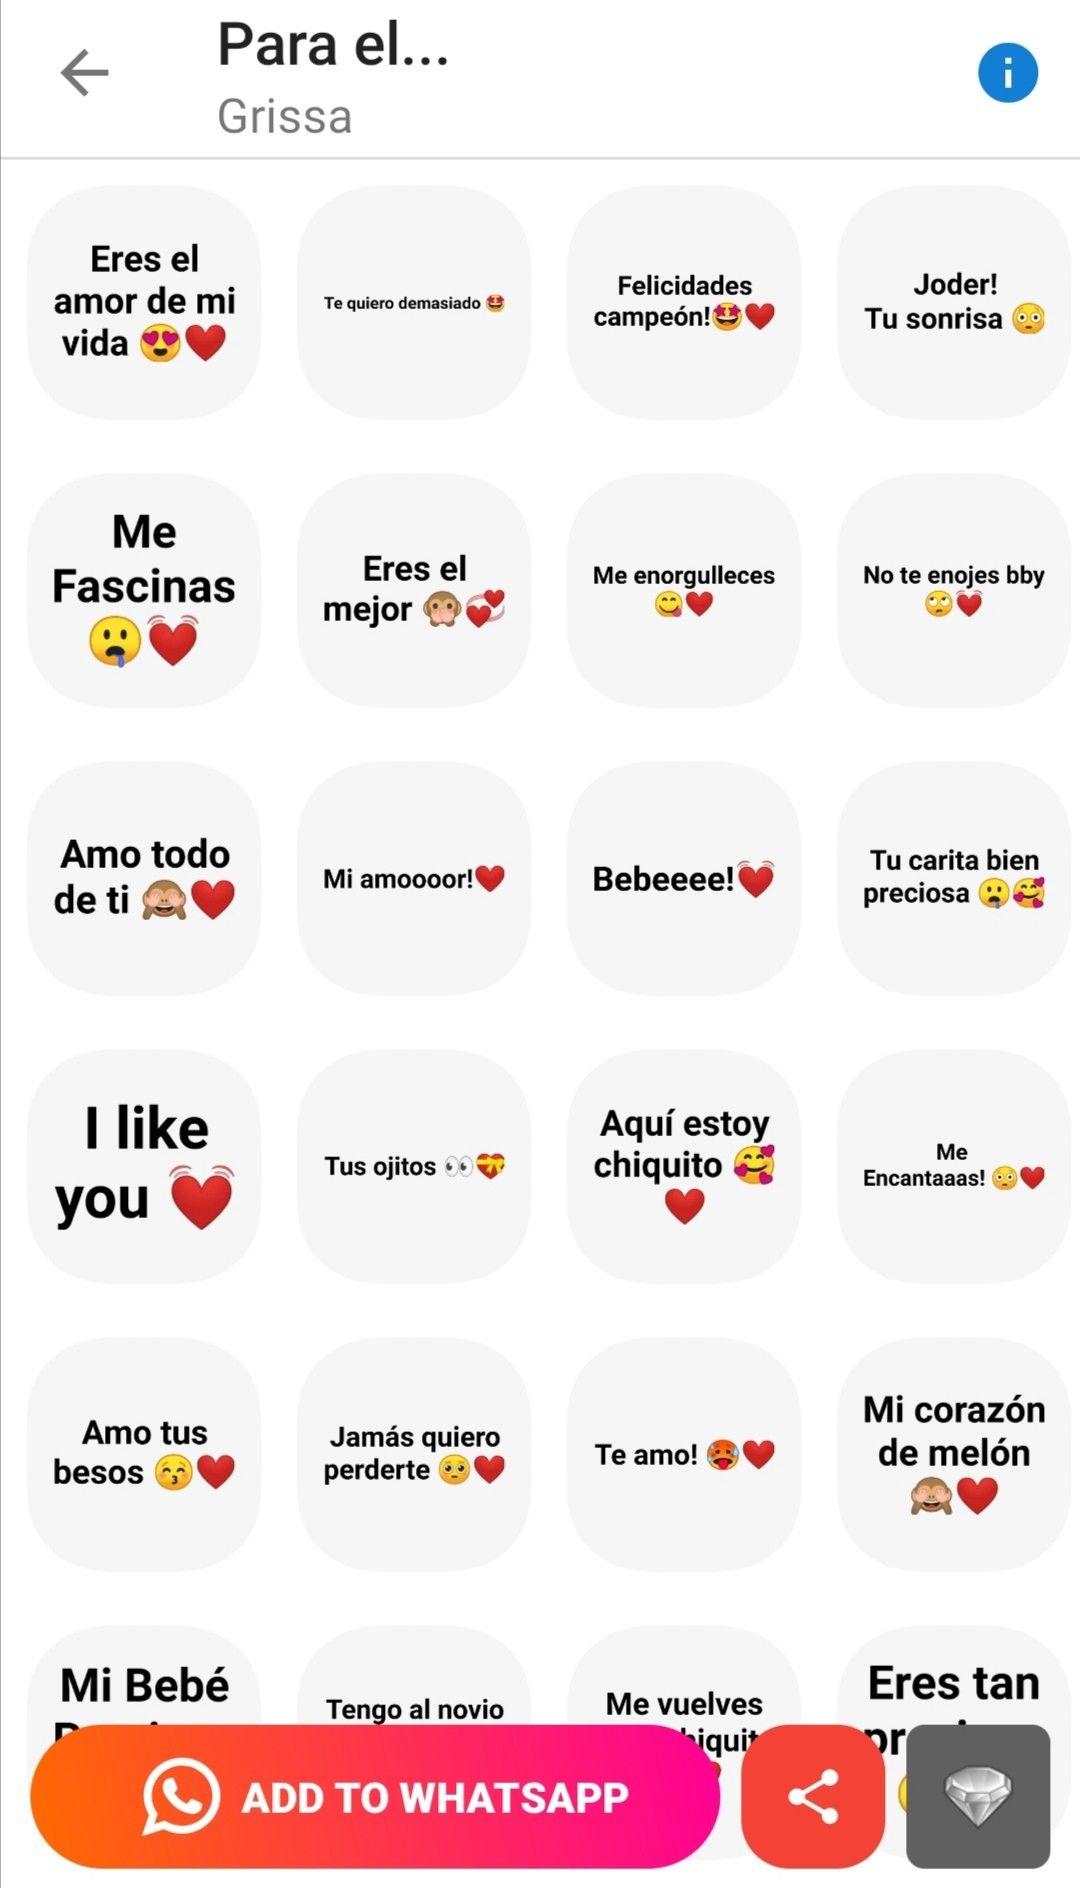 Stickers De Whatsapp Para El Whatsapp Apps App Google Play